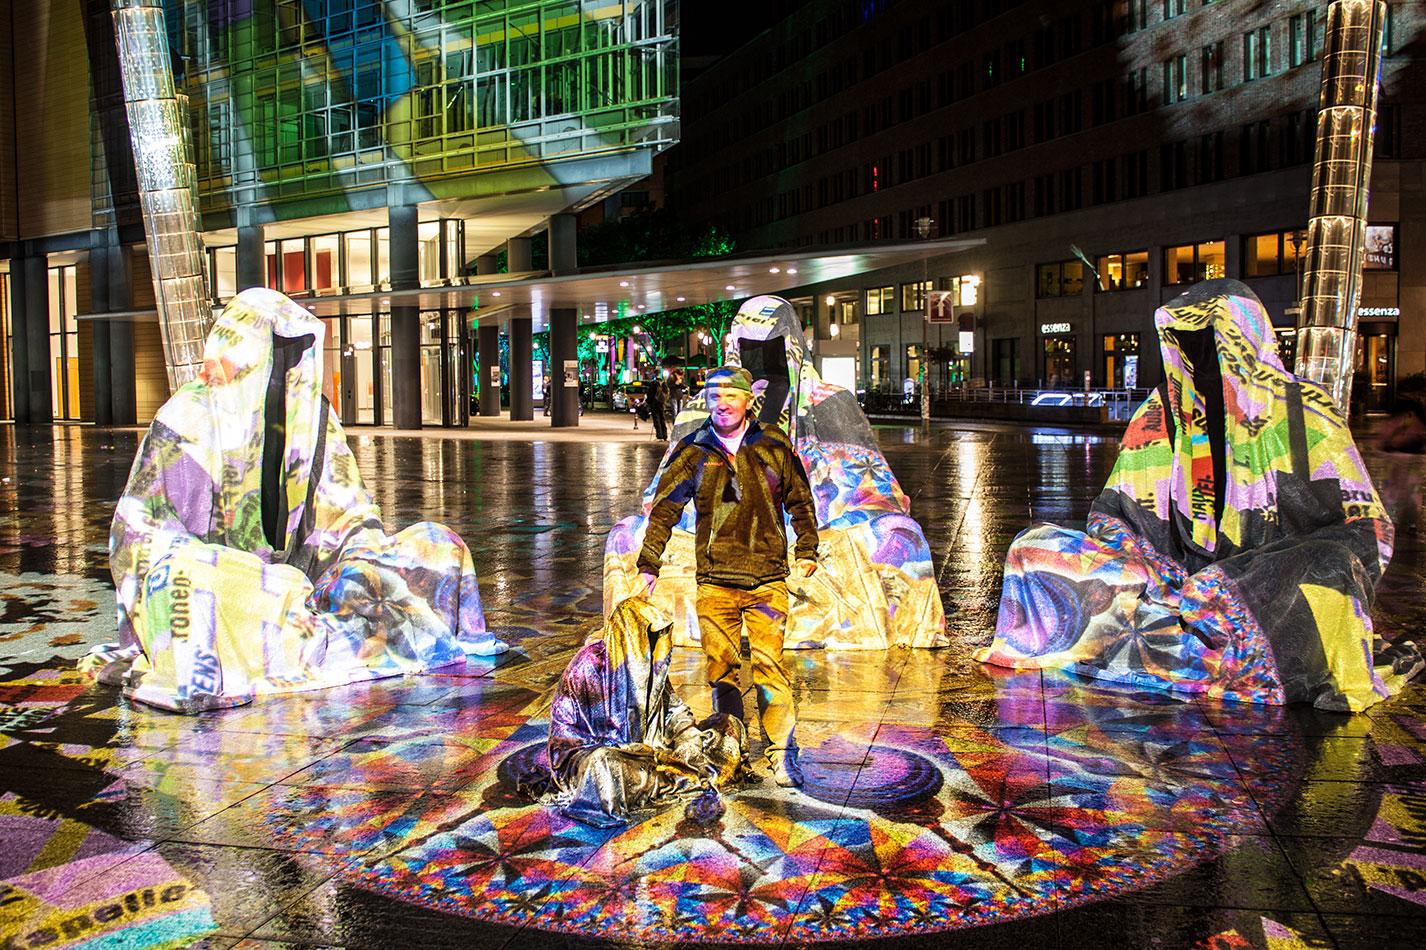 festival-of-lights-berlin-light-art-festival-contemporary-fine-art-design-show-large-scale-sculpture-guardiansof-time-manfred-kili-kielnhofer-sculpture-3892